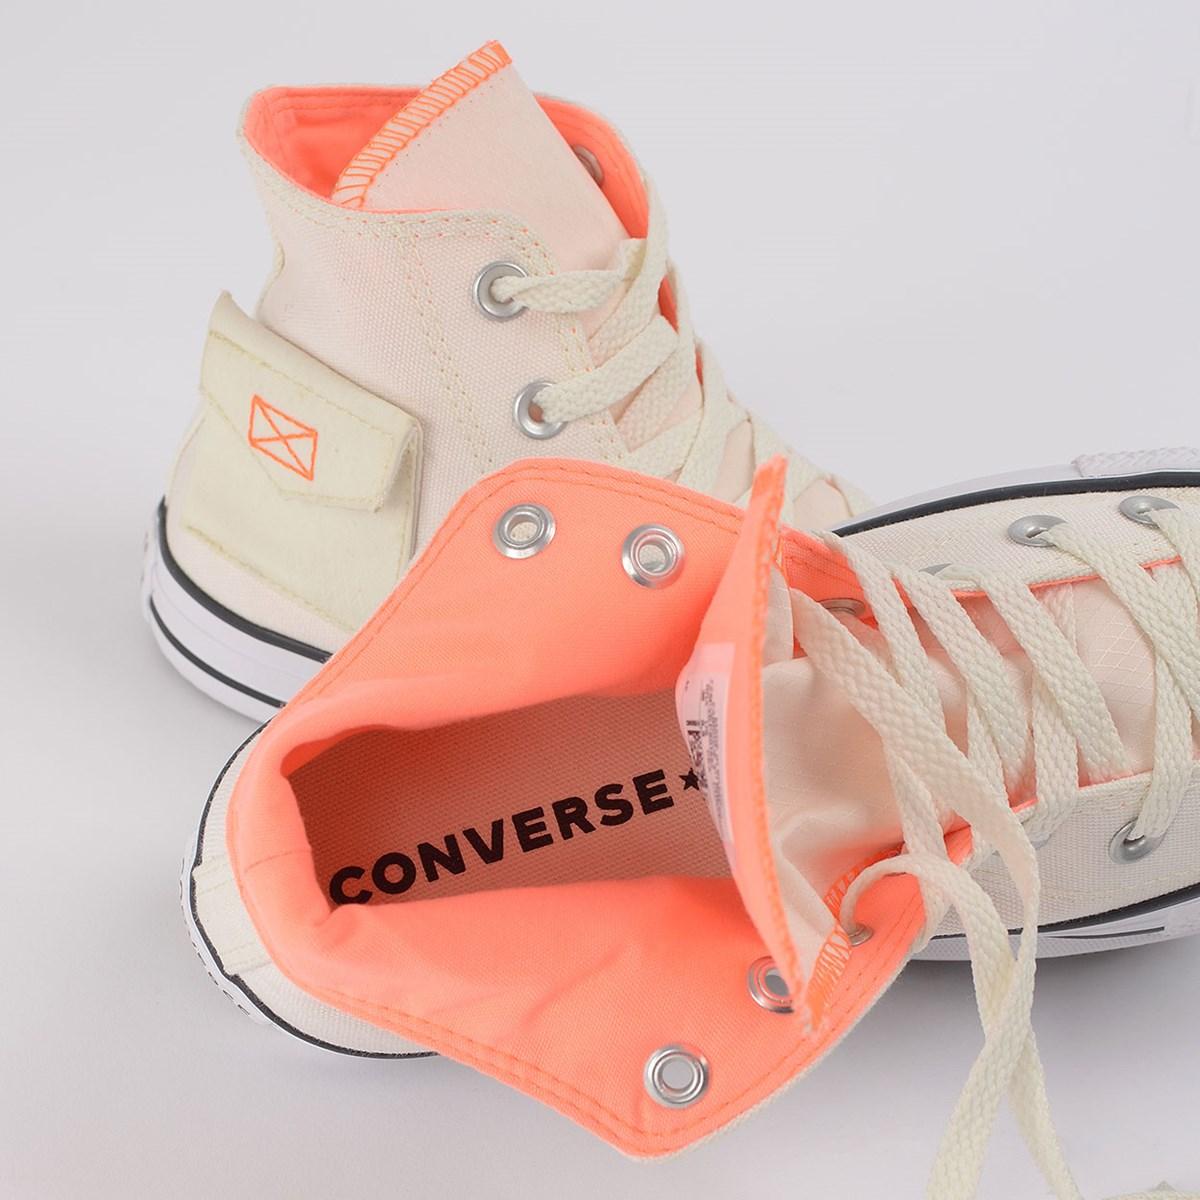 Tênis Converse Chuck Taylor All Star Pocket Hi Bege Claro CT14830002